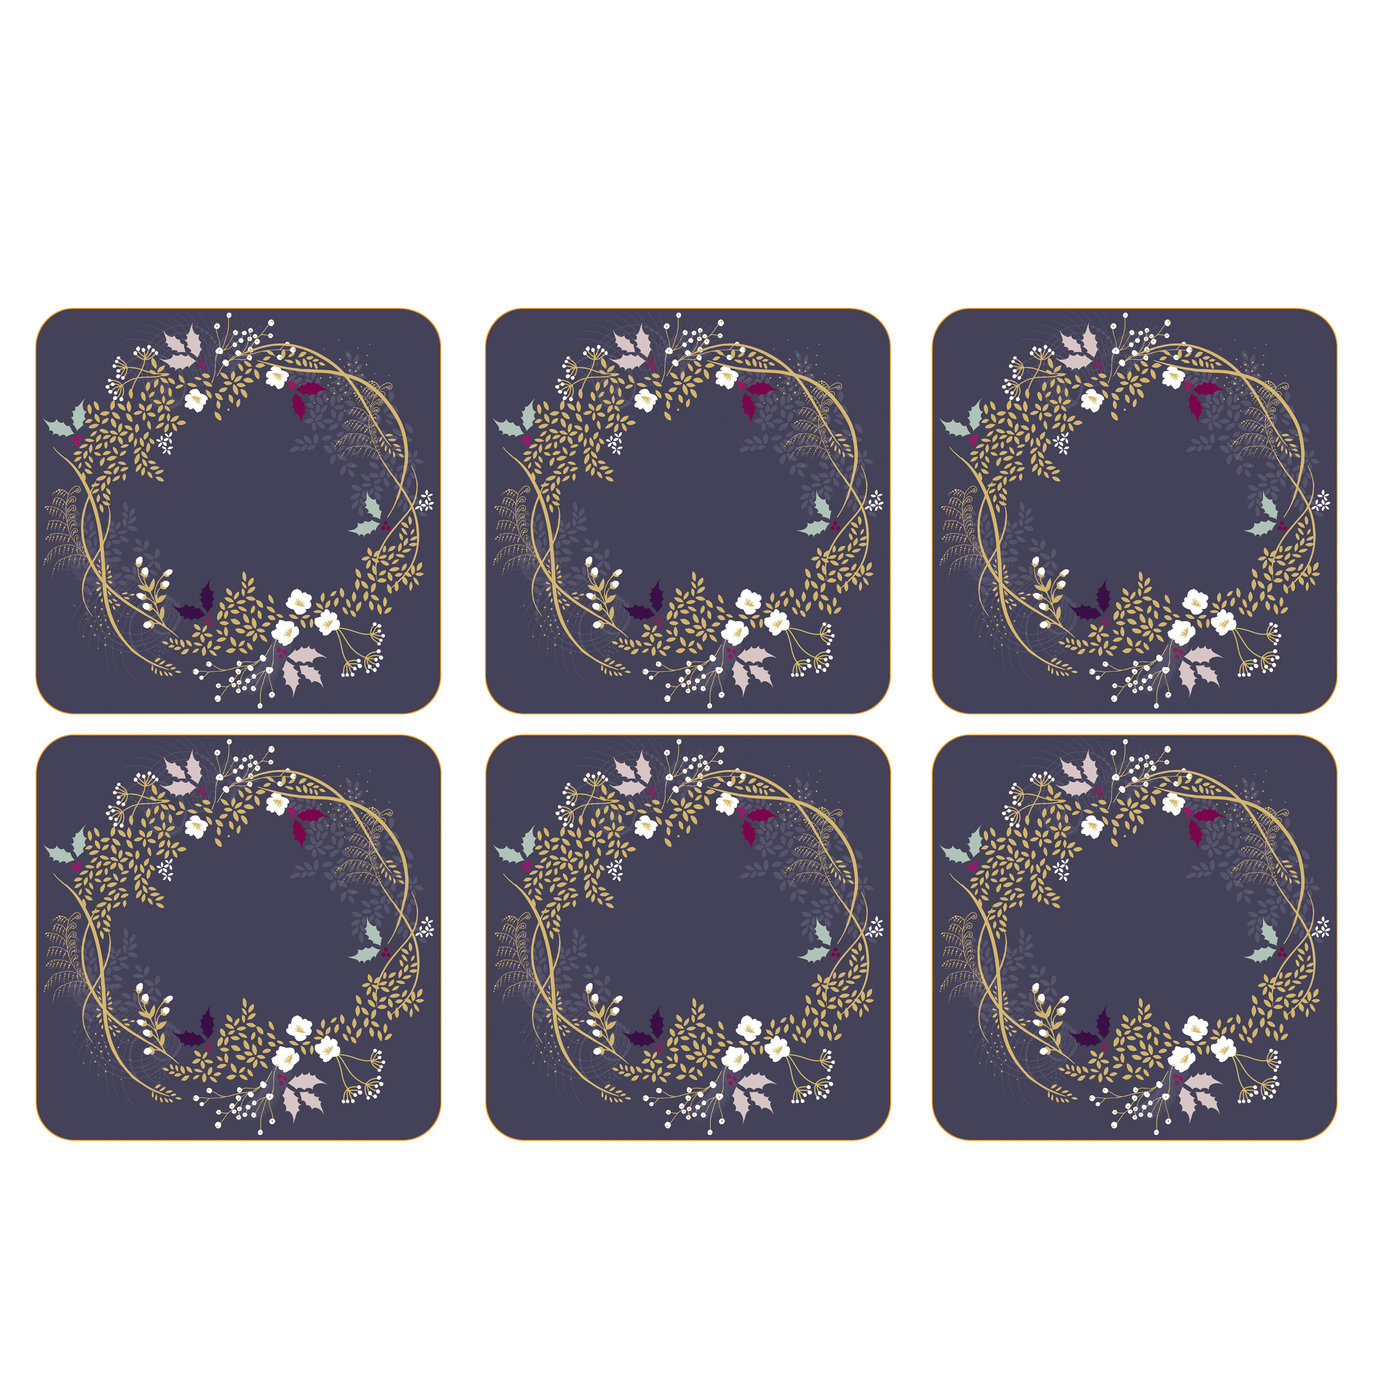 Sara Miller London Portmeirion Garland Coasters Set of 6